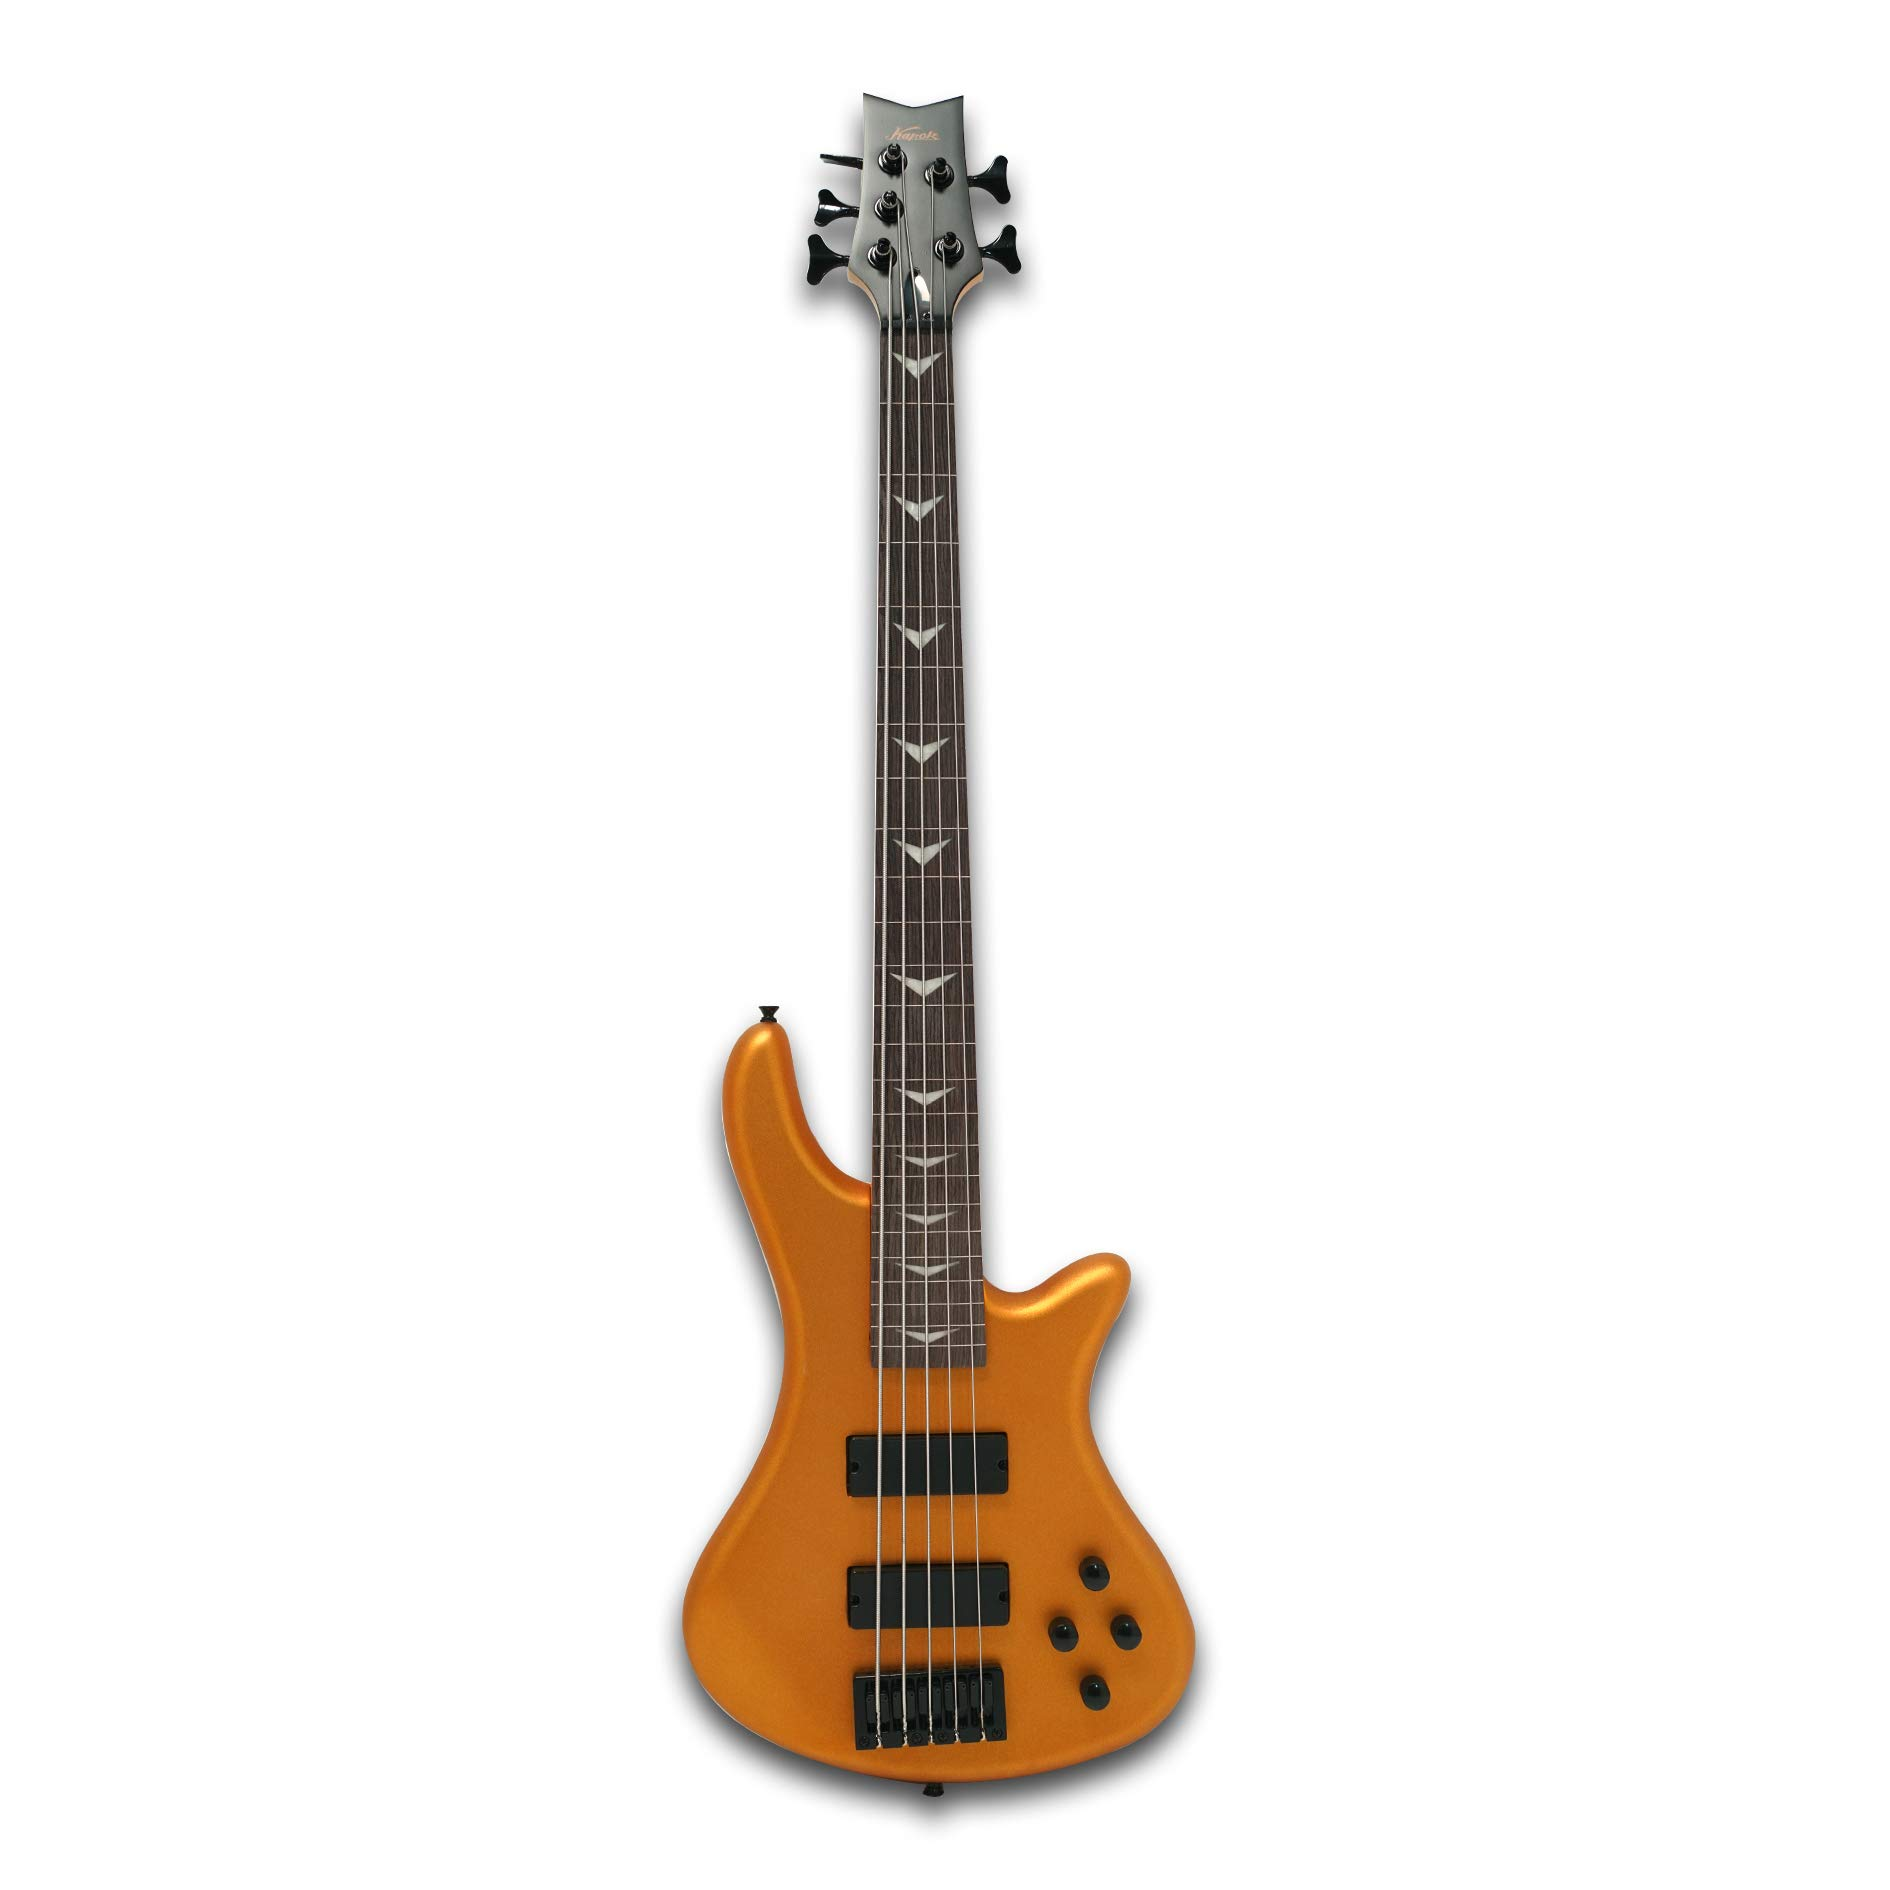 Fretless 5 String Electric Bass